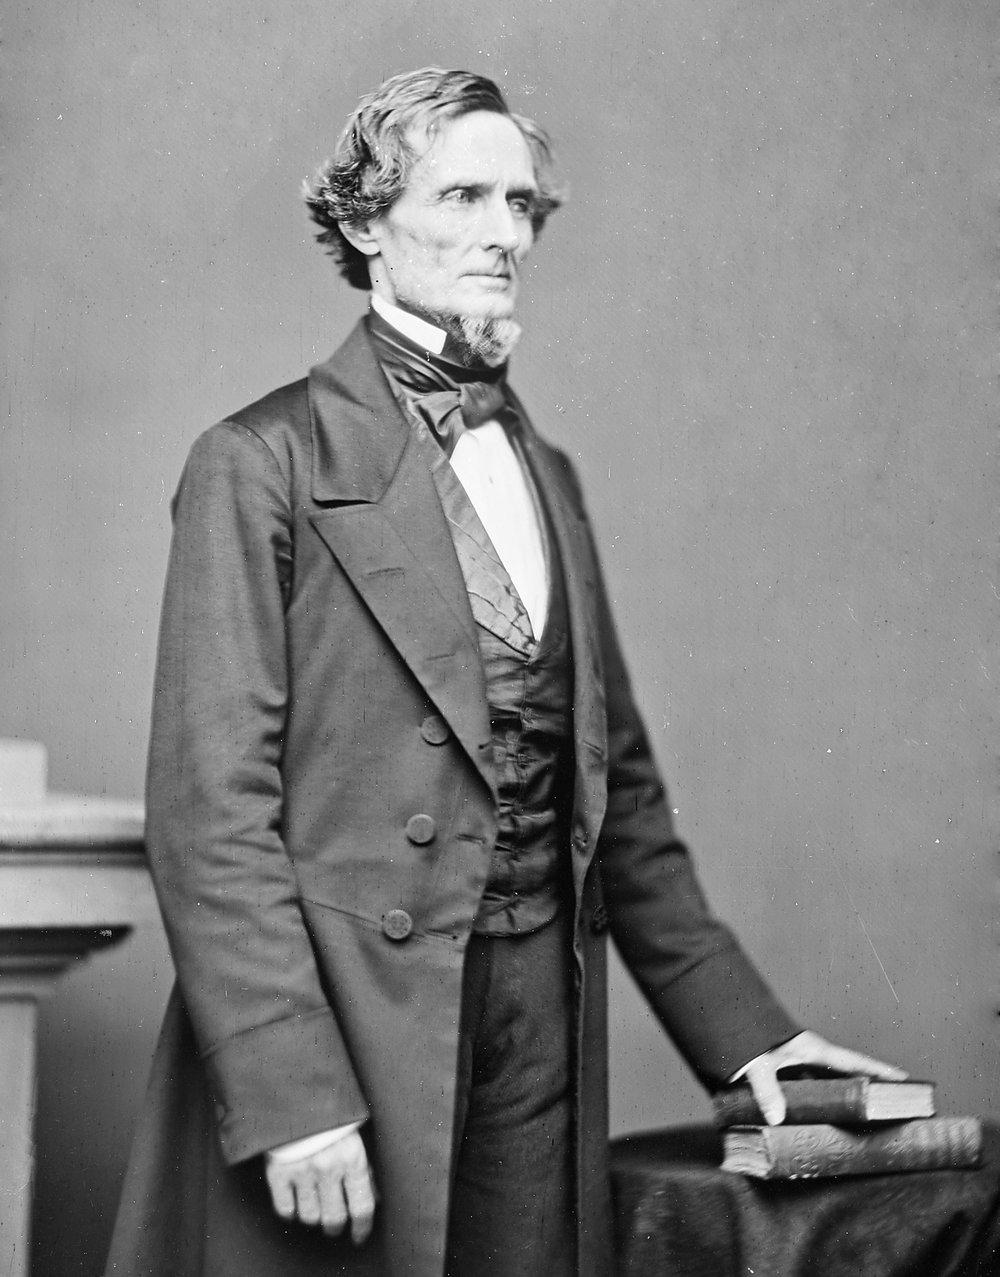 Confederate President Jefferson Davis. Courtesy of the Library of Congress.